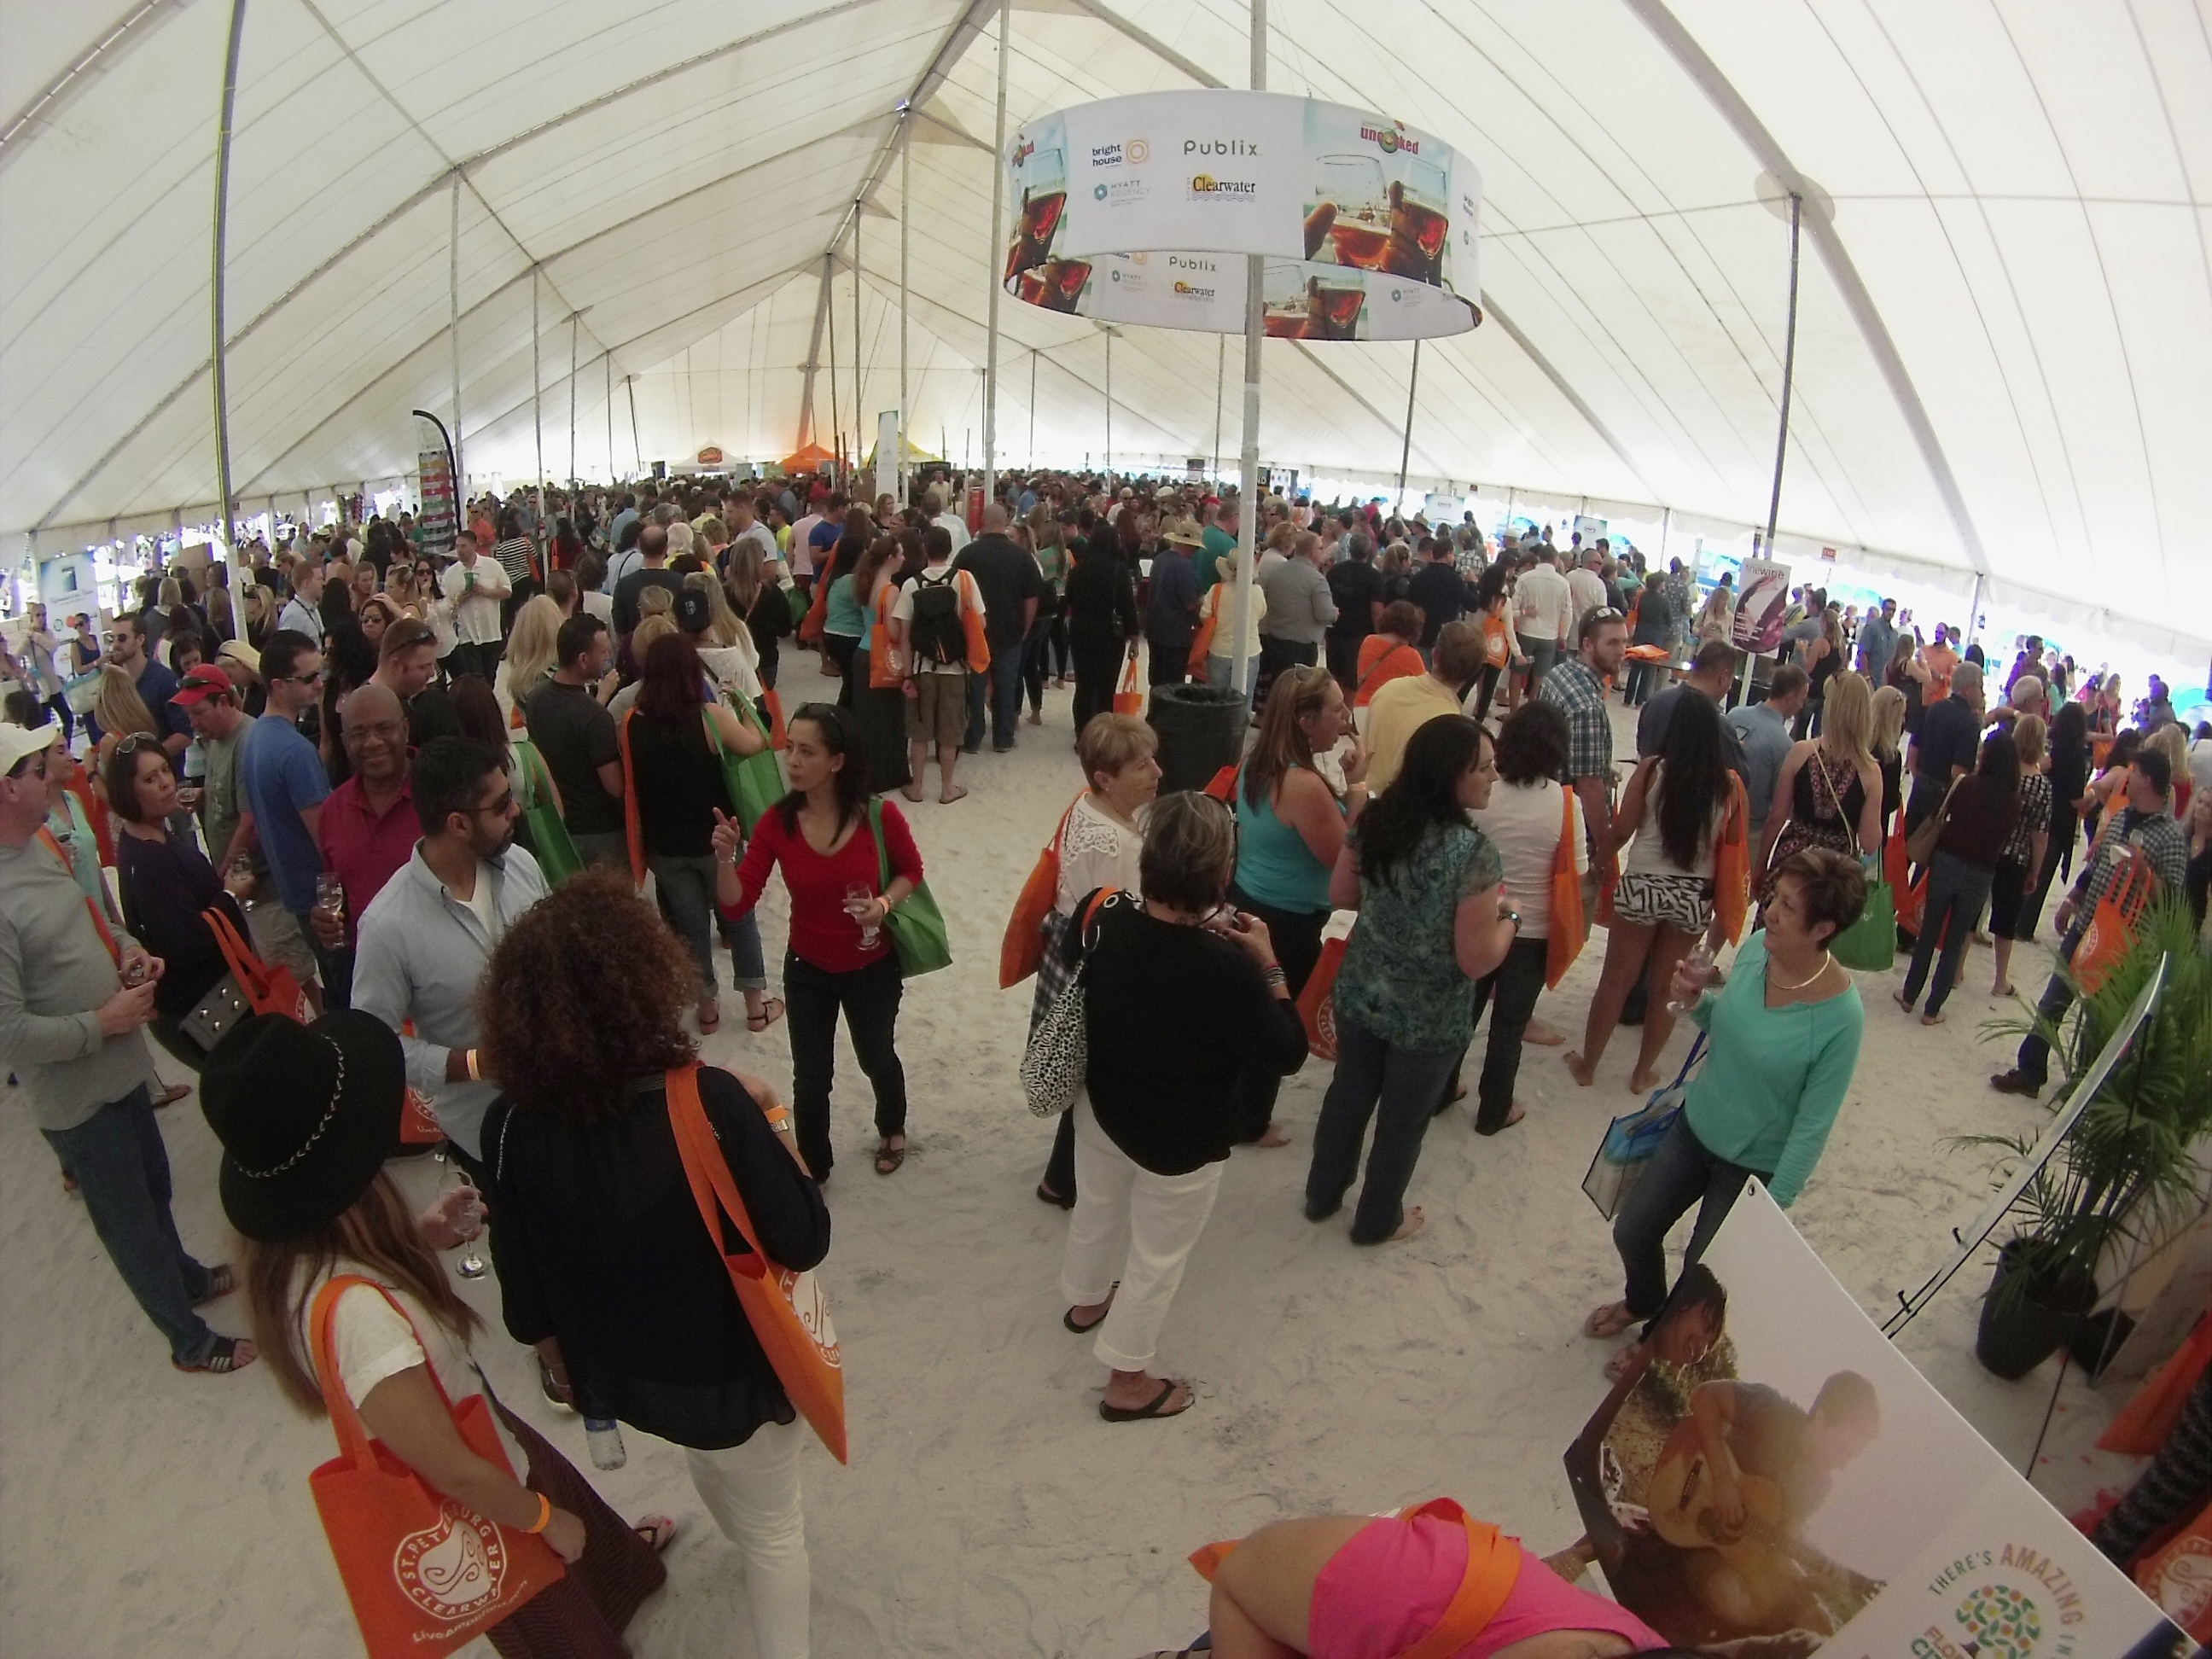 Clearwater Beach Uncorked, Food, Wine & Beer Festival. Clearwater Beach, Florida, Feb. 7, 2015